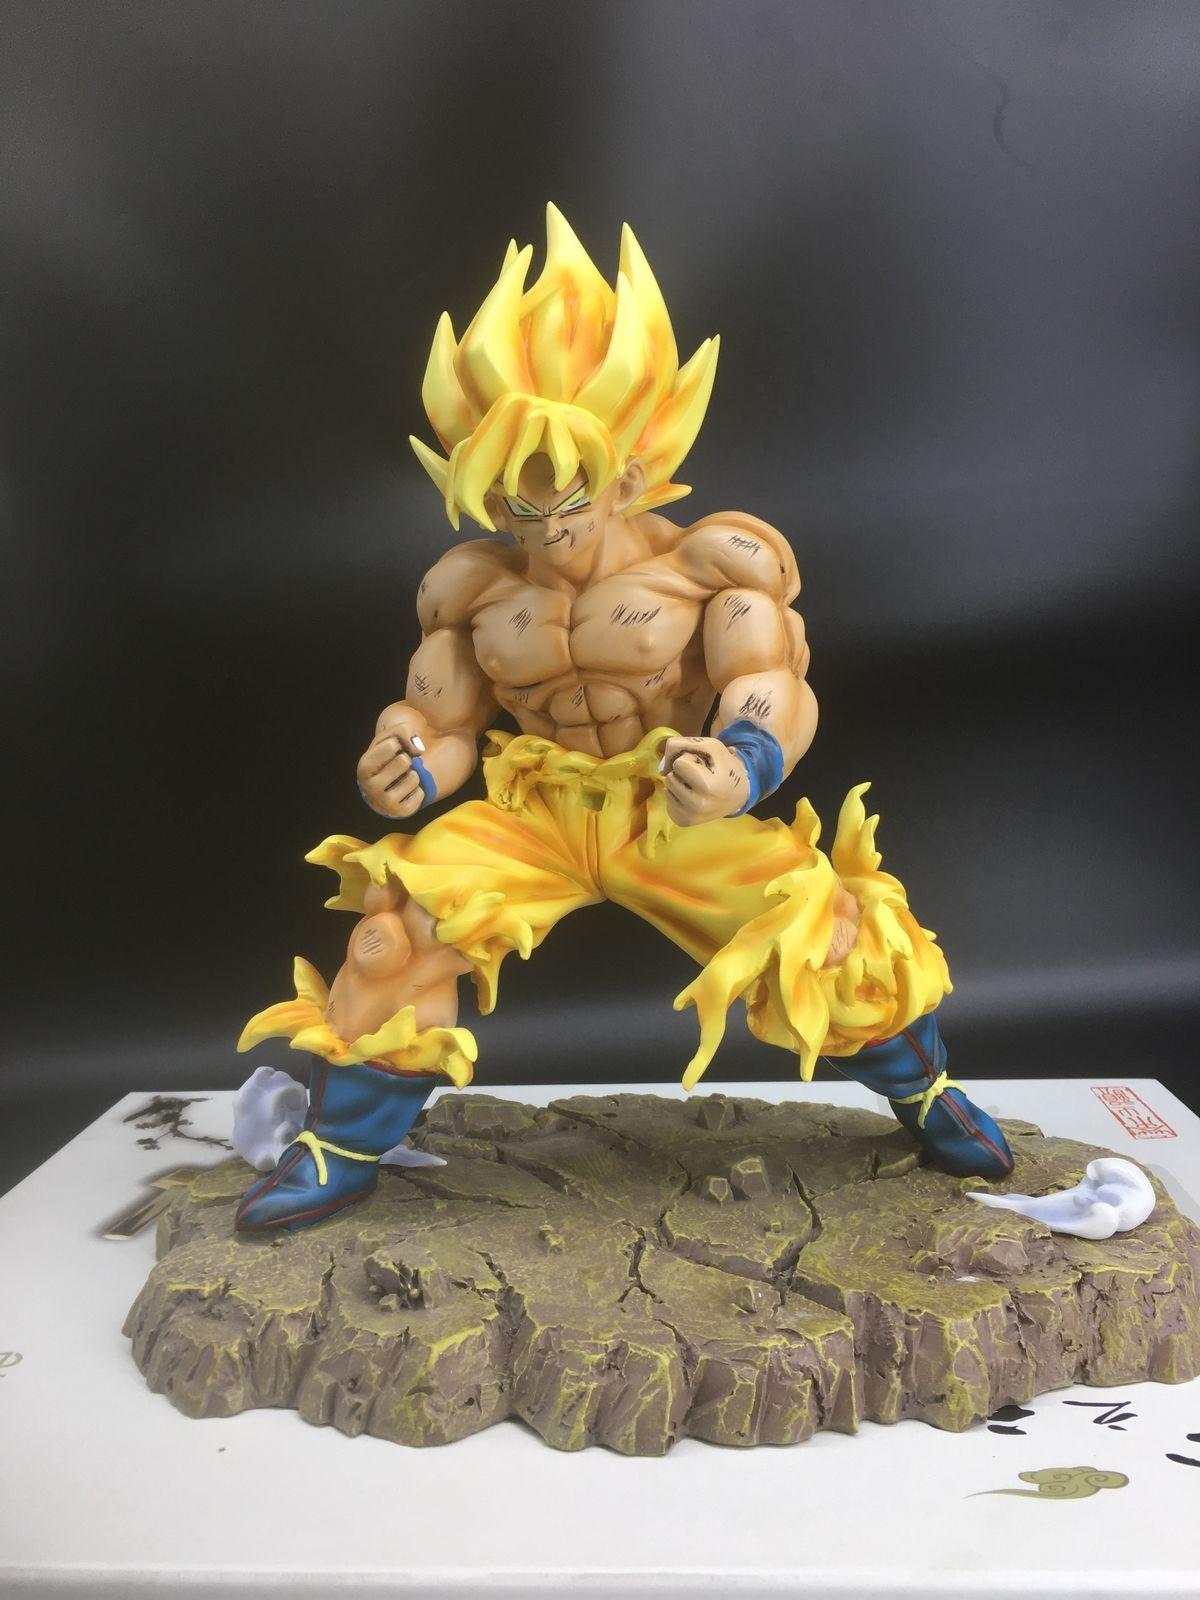 Flight Tracker Dragon Ball Z Dbz Super Saiyan War Damage Ssj Goku Resin Gk Statue Figure 11inch Toys & Hobbies